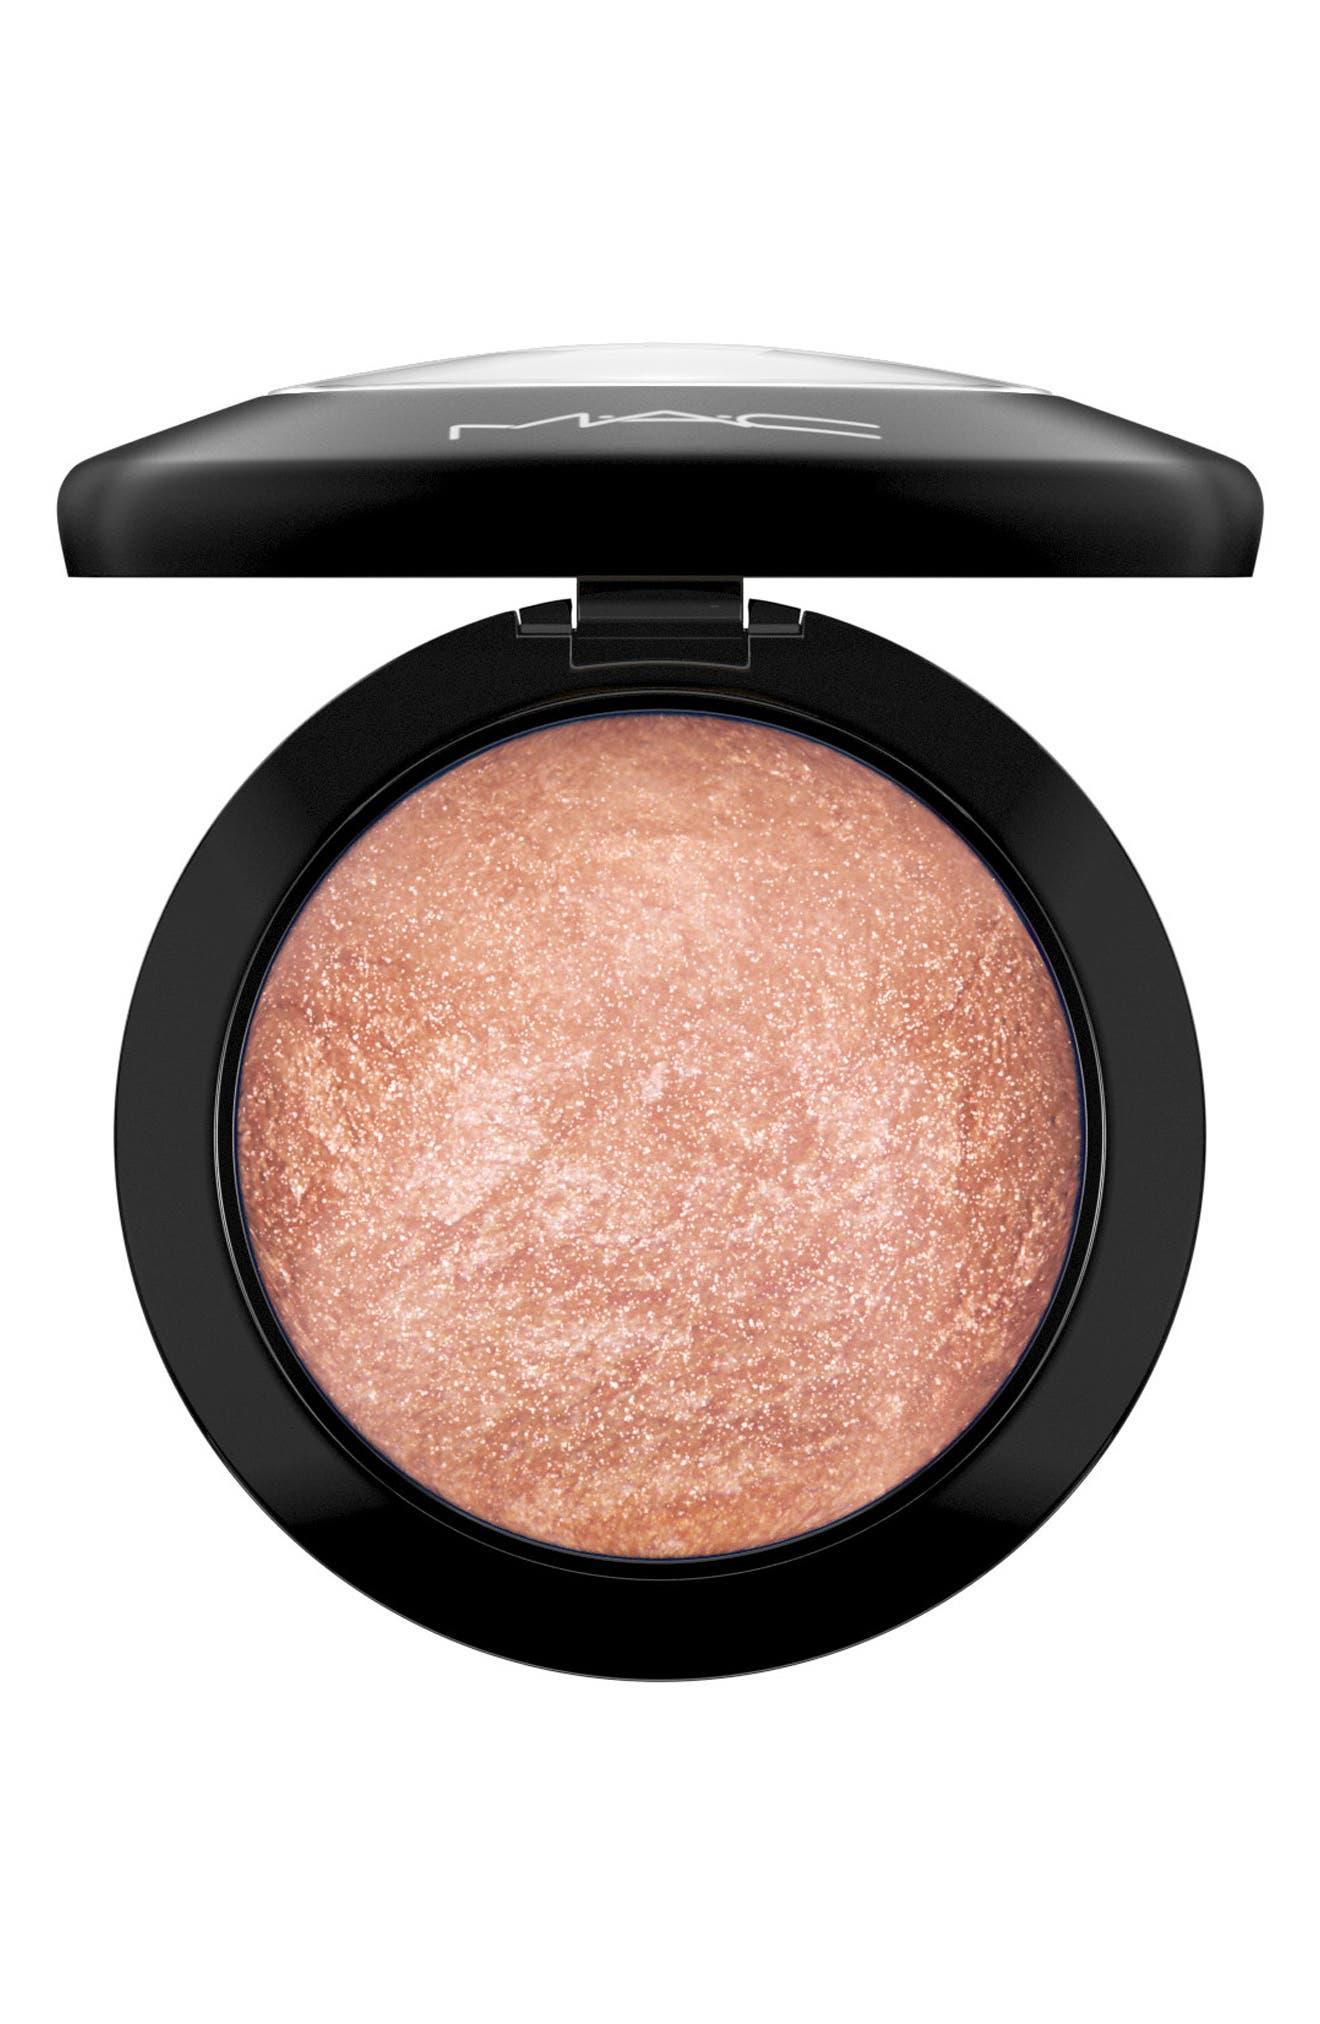 MAC Mineralize Skinfinish Powder Highlighter